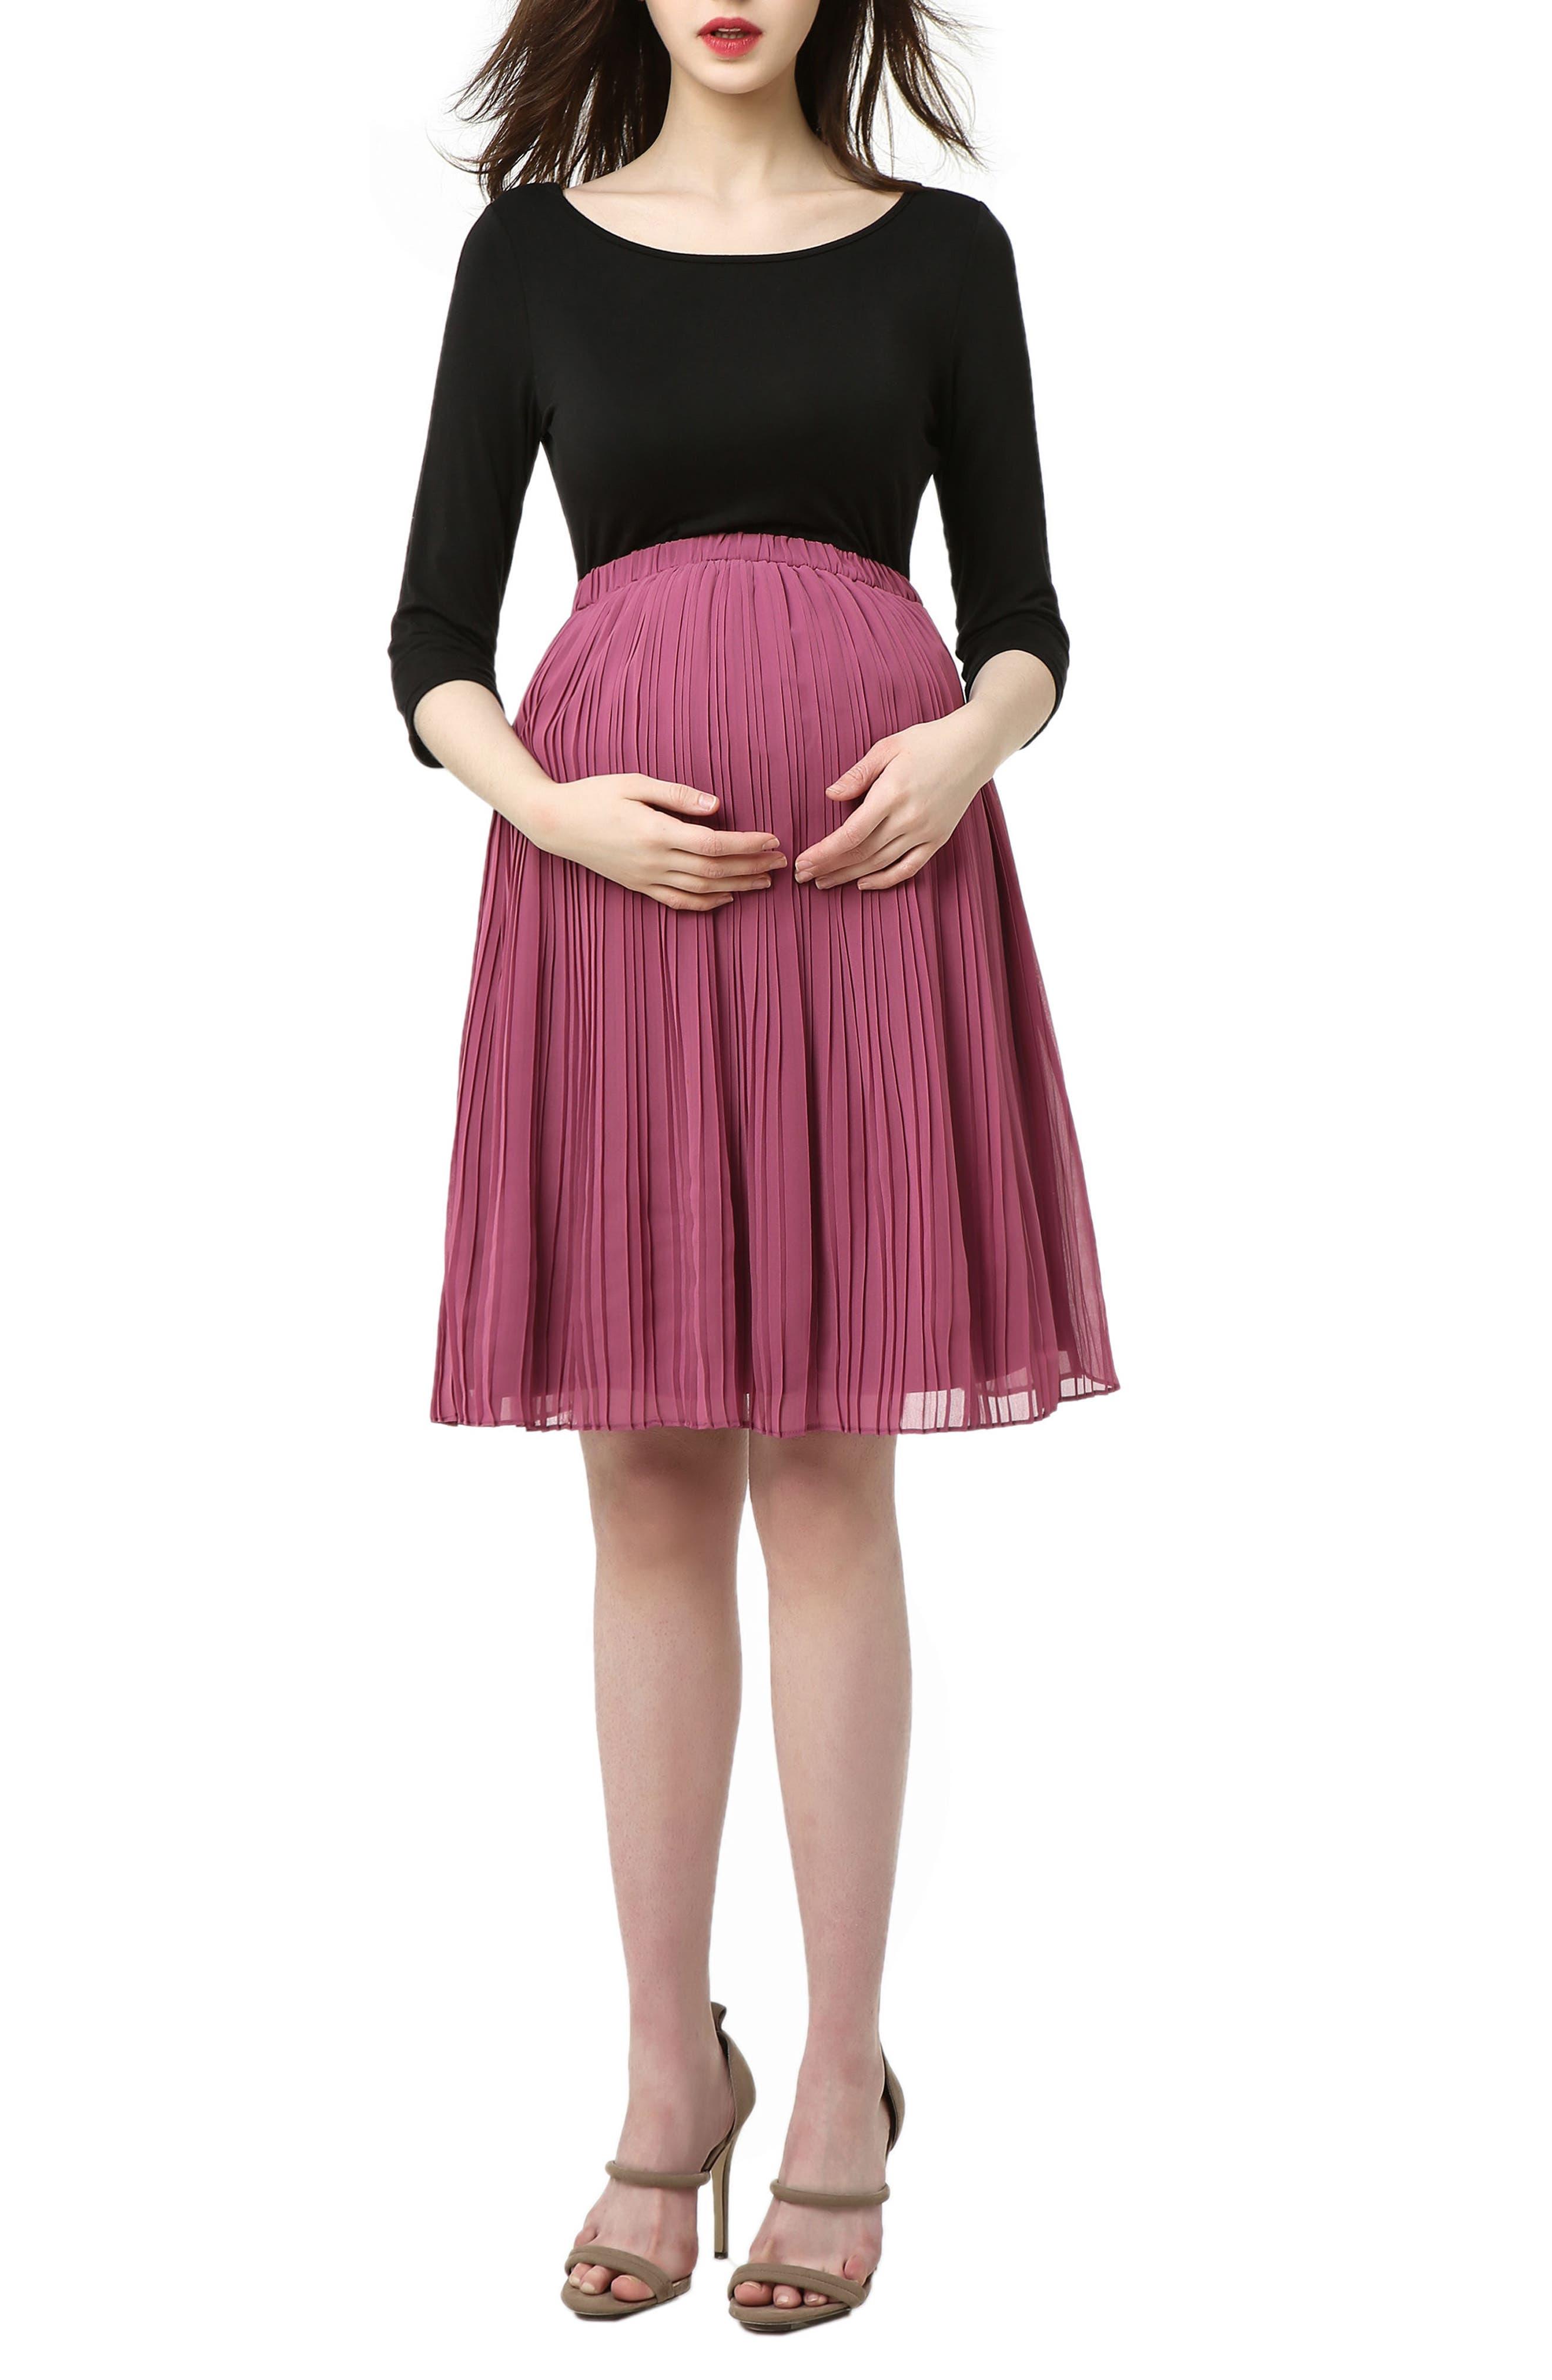 Marie Colorblock Pleat Skirt Maternity Dress,                             Main thumbnail 1, color,                             Black